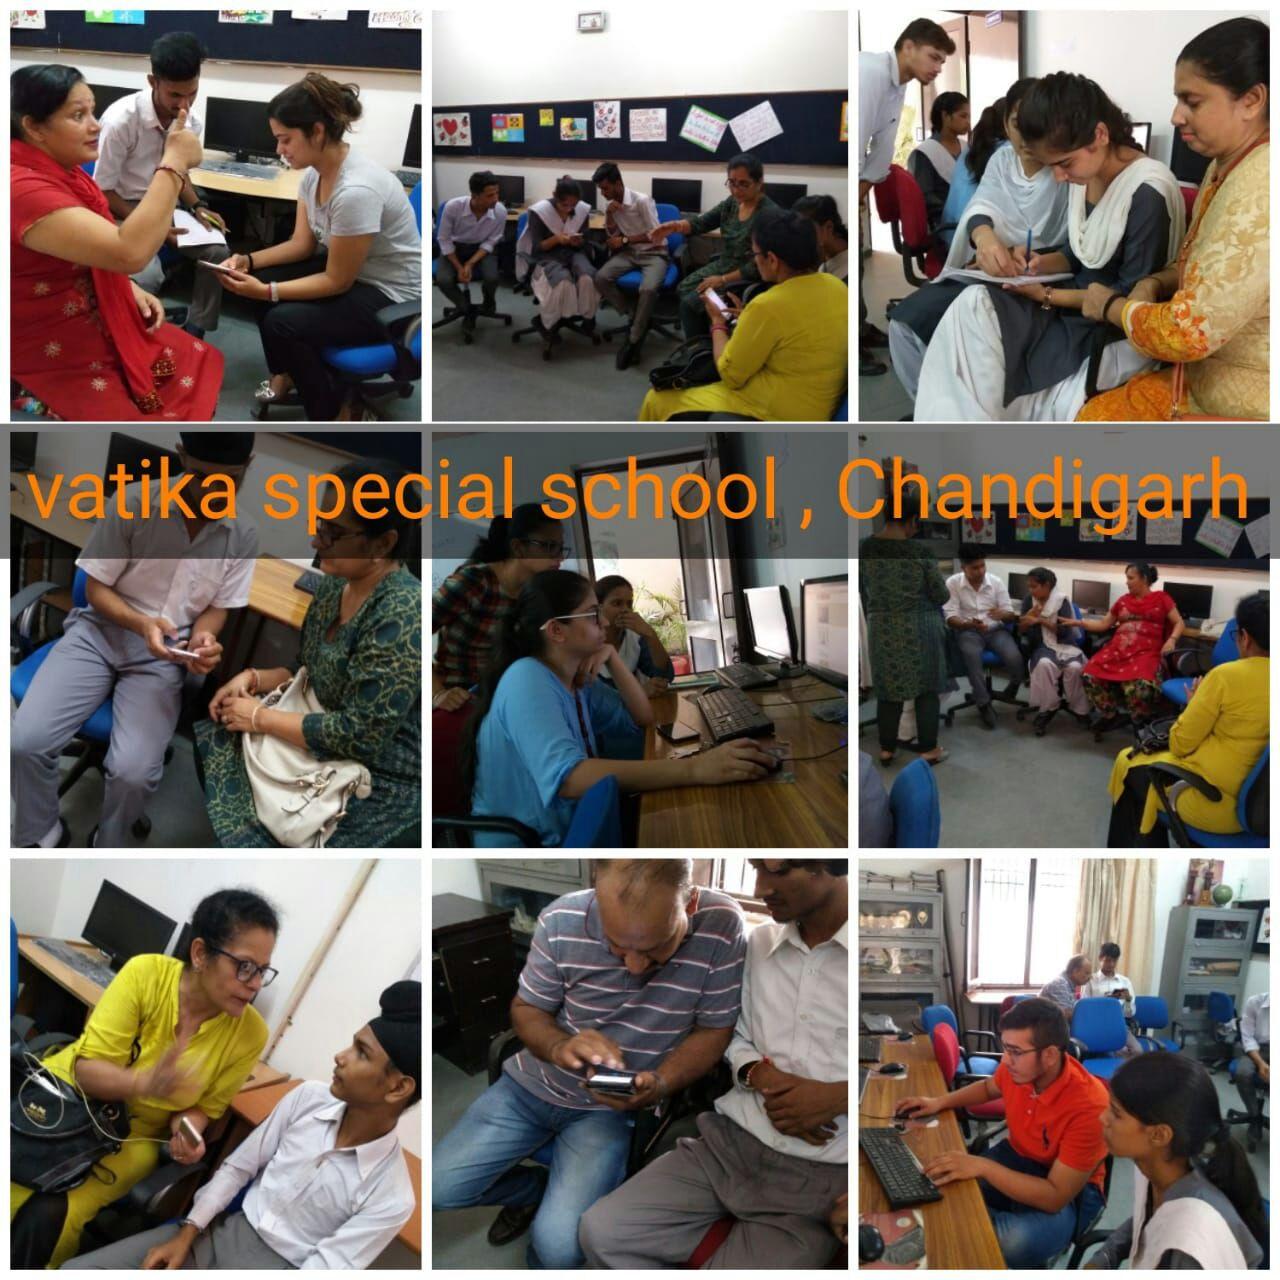 vatika special school of deaf & dumb  Chandigarh.jpeg